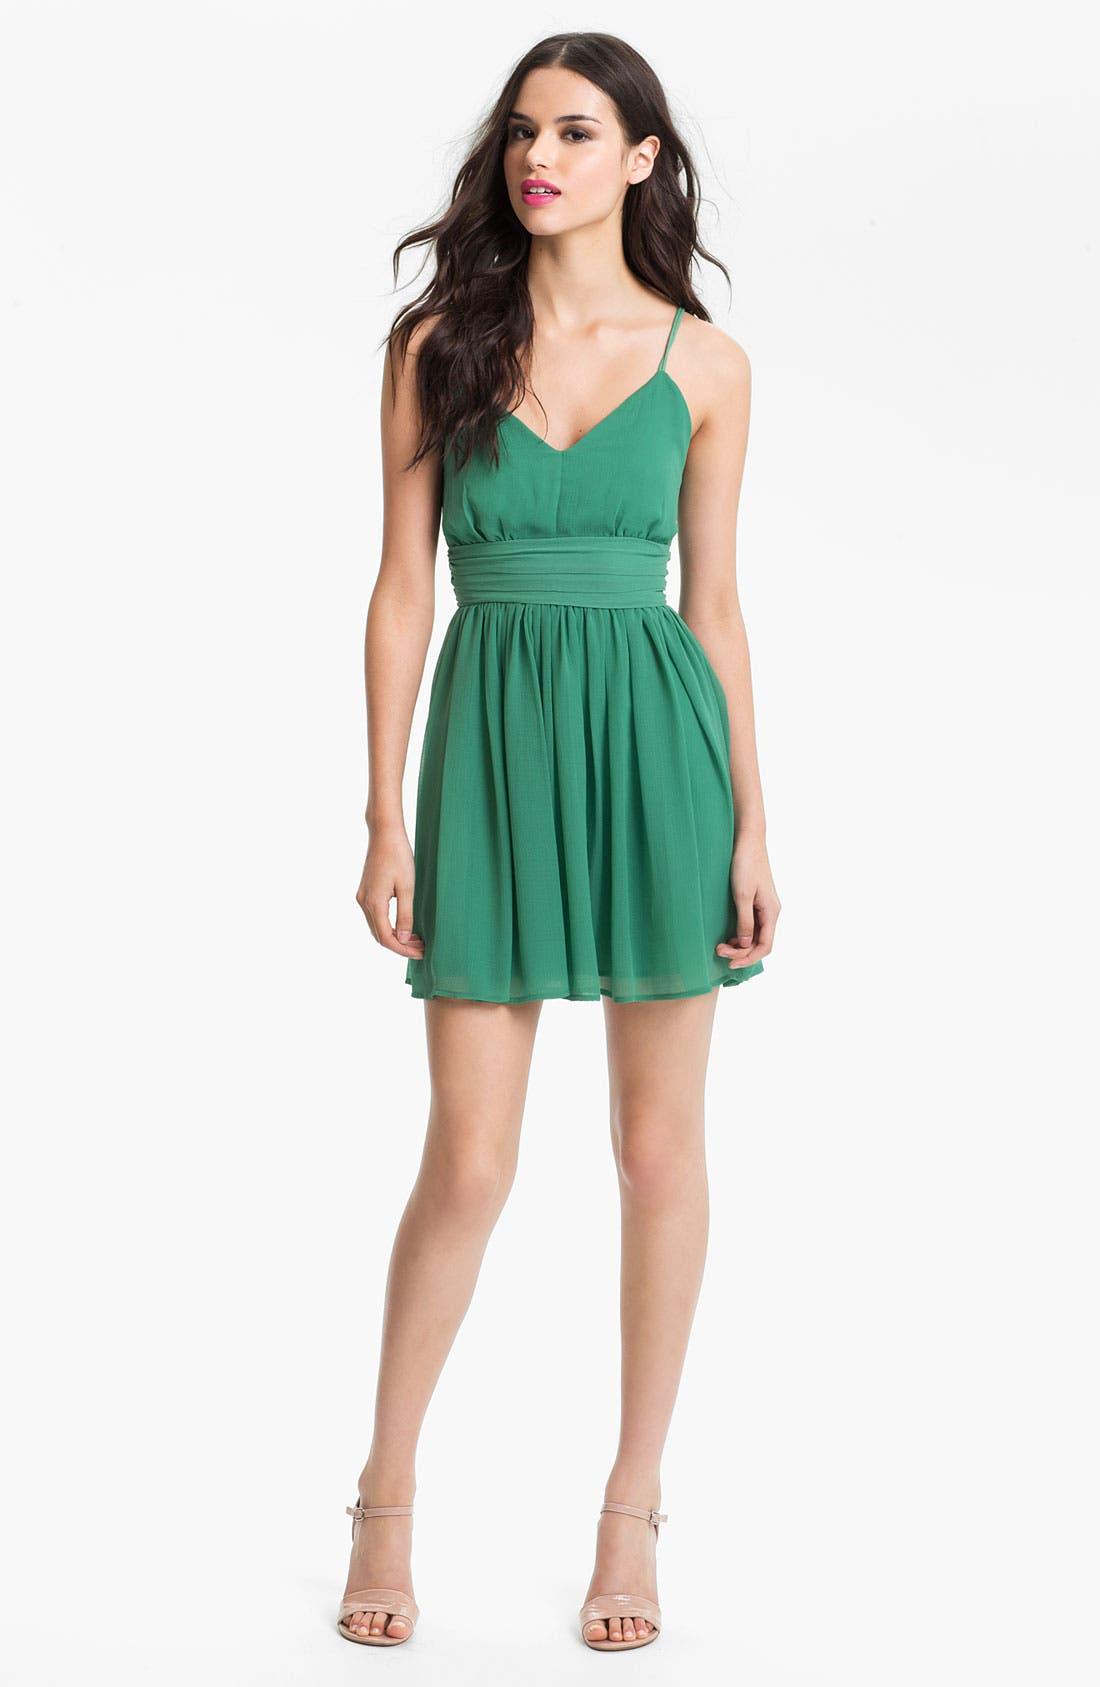 Main Image - BB Dakota 'Edie' Spaghetti Strap Chiffon Dress